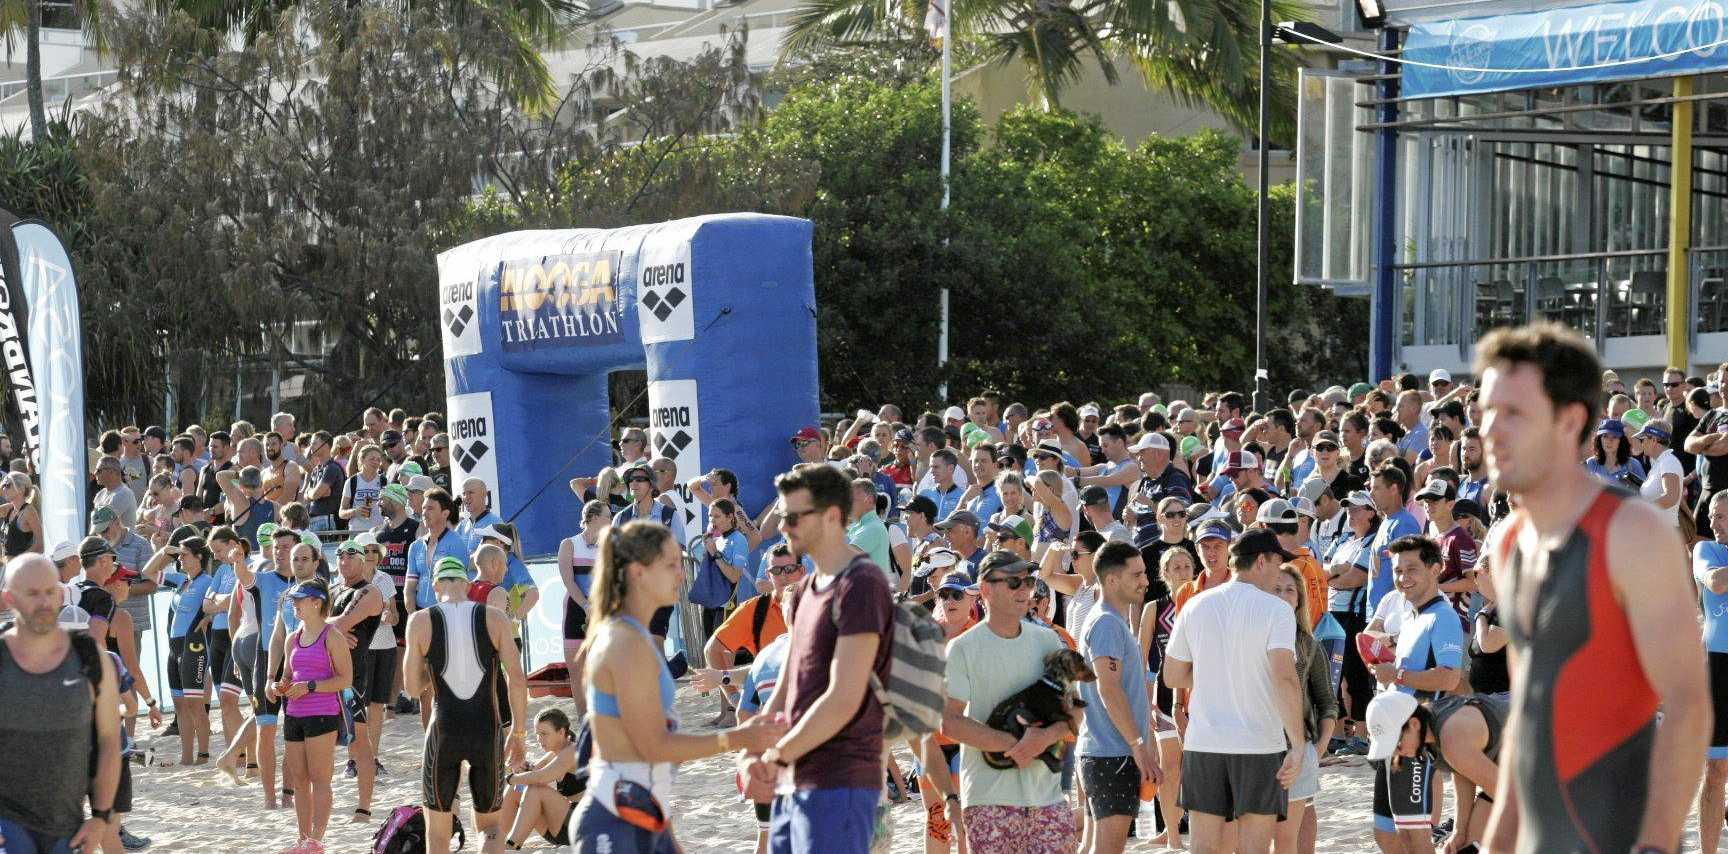 Spectators and athletes enjoy the 2016 Noosa Triathlon.Overview of start of swim leg at Main Beach Noosa.